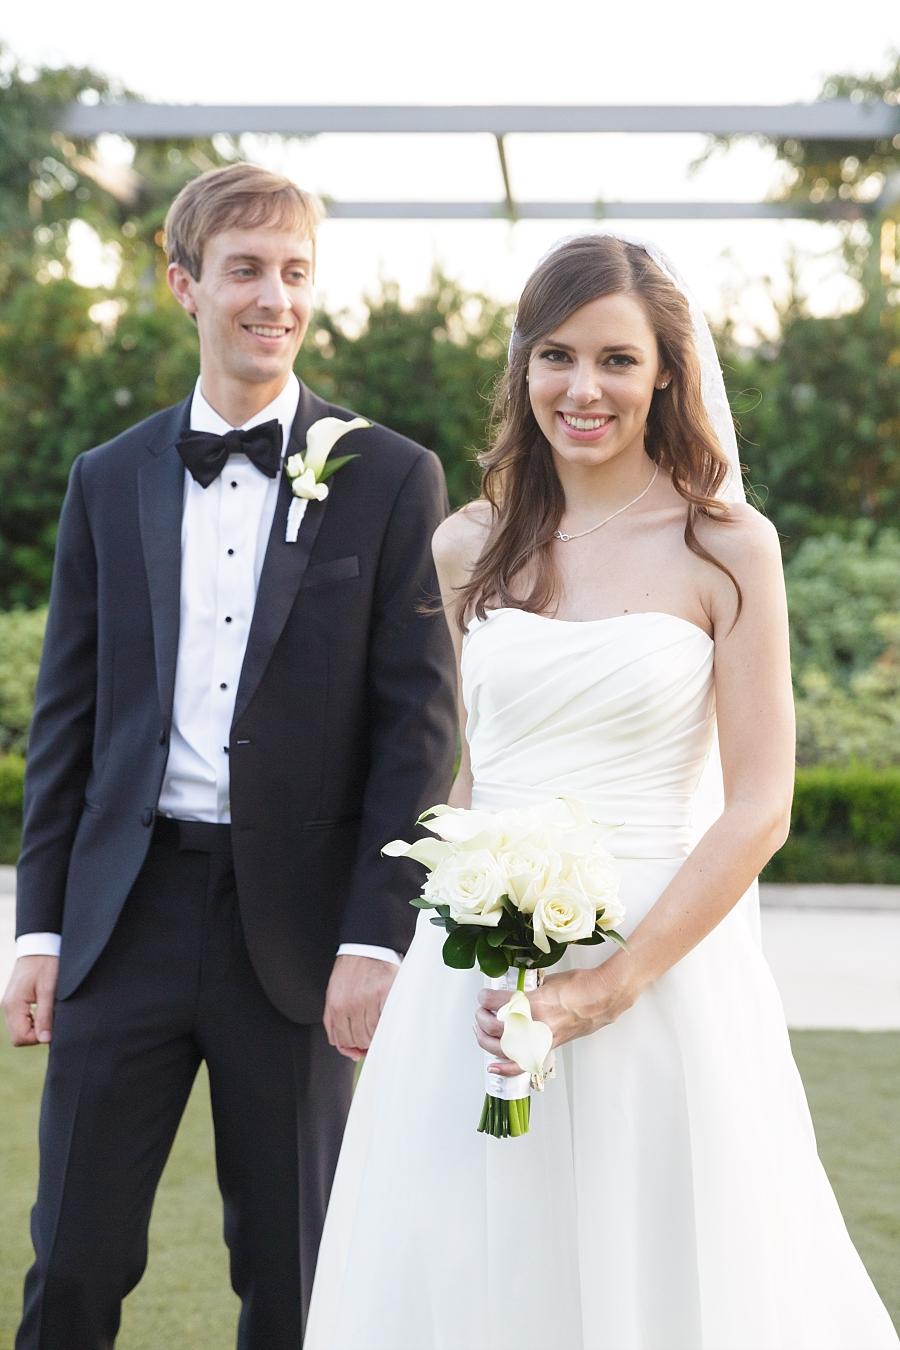 Stacy-Anderson-Photography-McGovern-Centennial-Gardens-Houston-Wedding-Photographer_0069.jpg